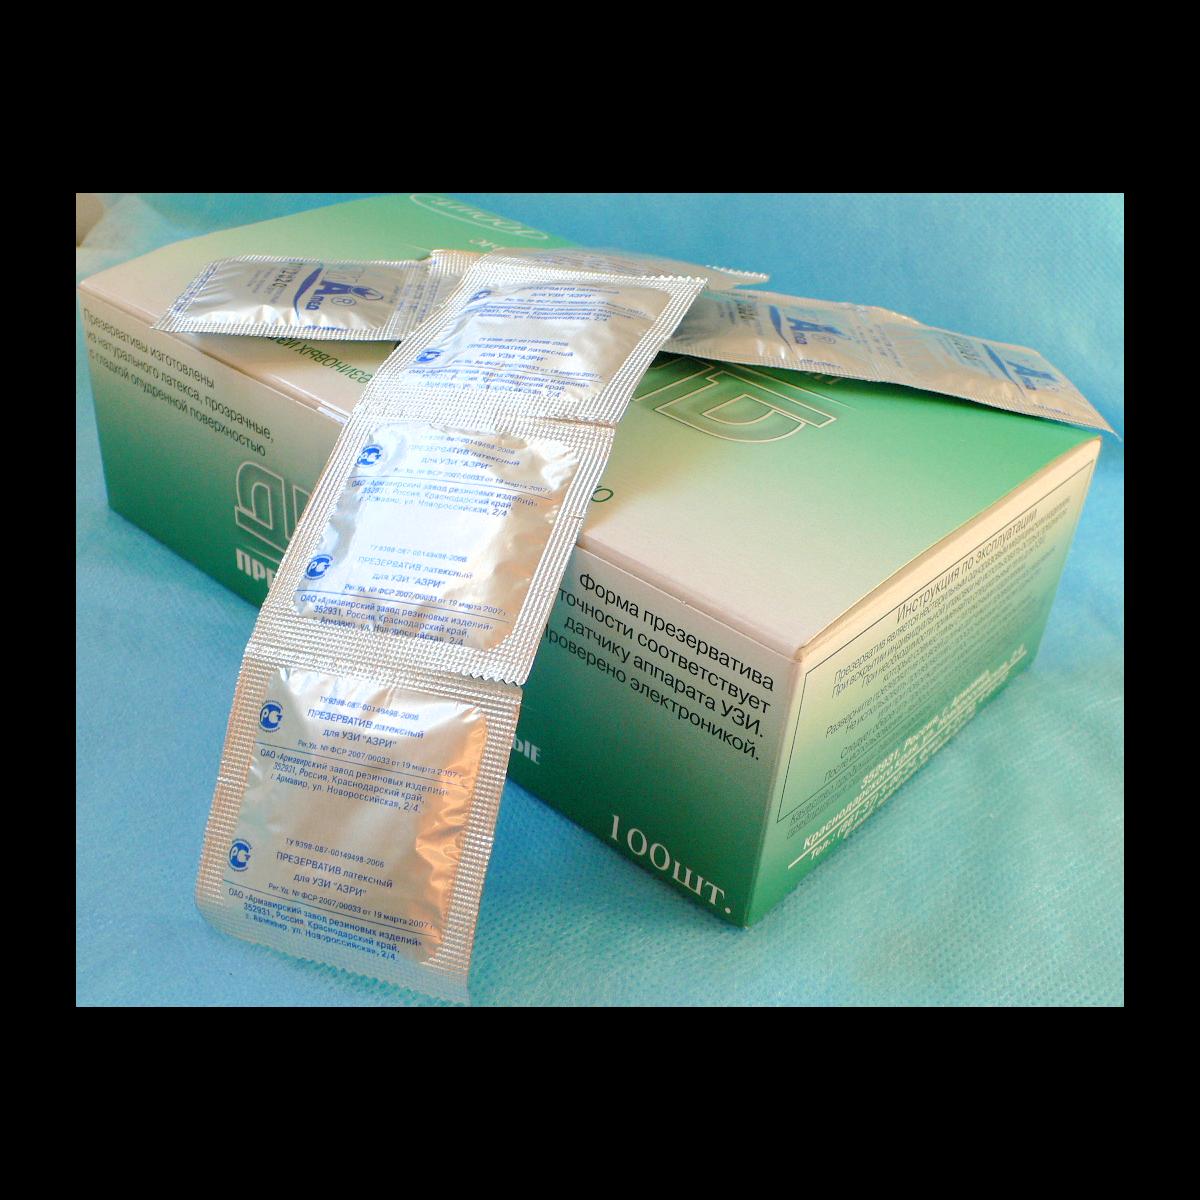 Презервативы для УЗИ АЗРИ, Россия (6,75 руб/шт)